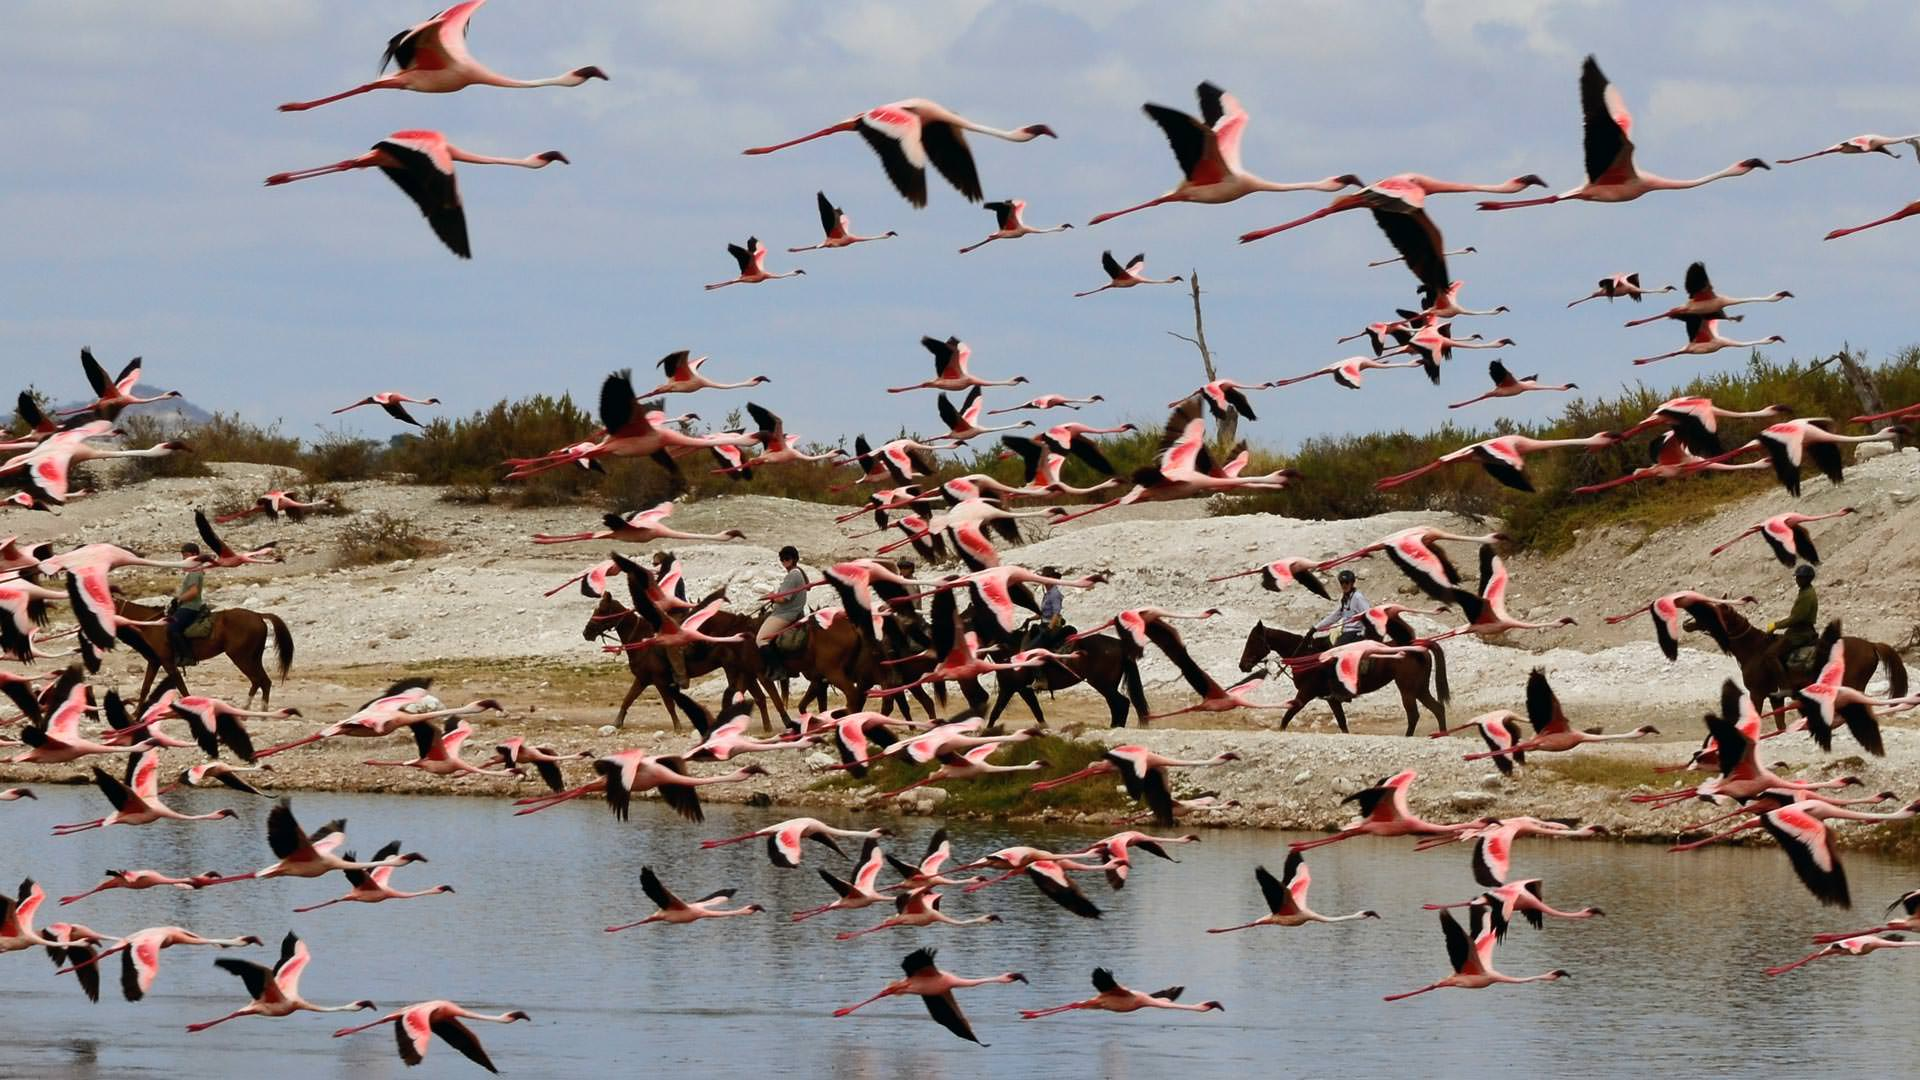 Flamingo and Horse Riders at Sinya Mines